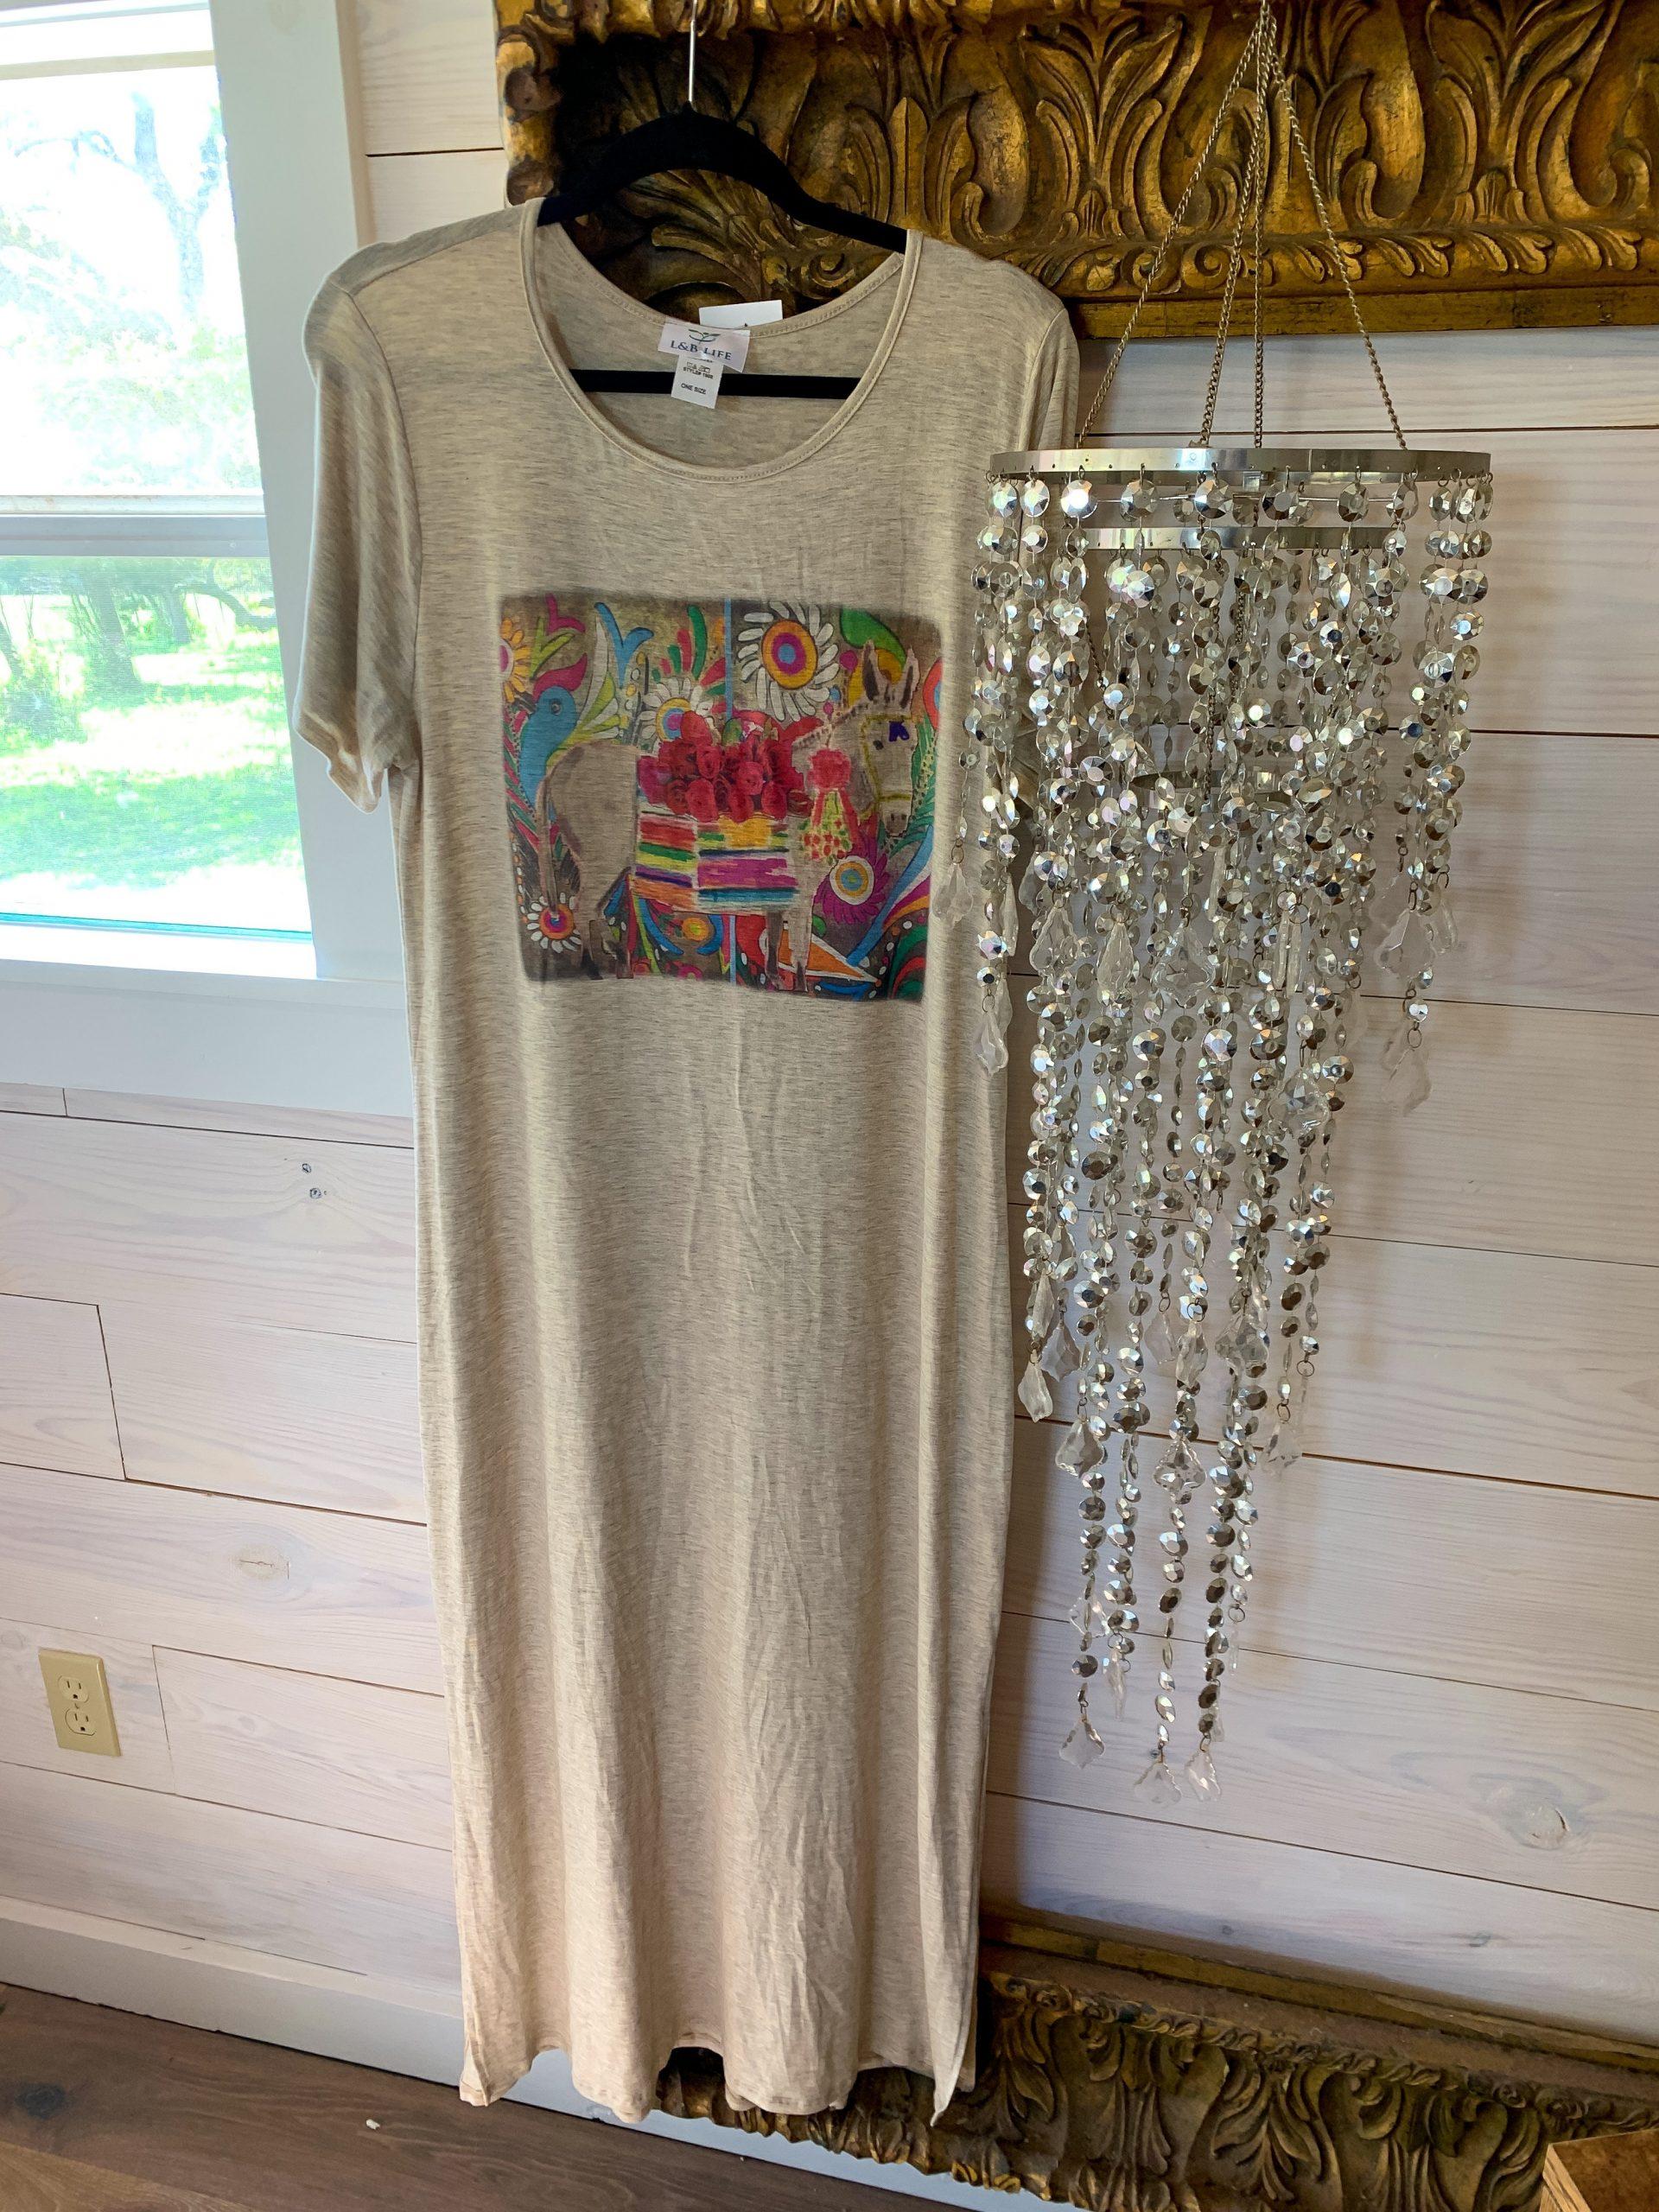 Donkey & Bird Fiesta on Oatmeal Tshirt Dress